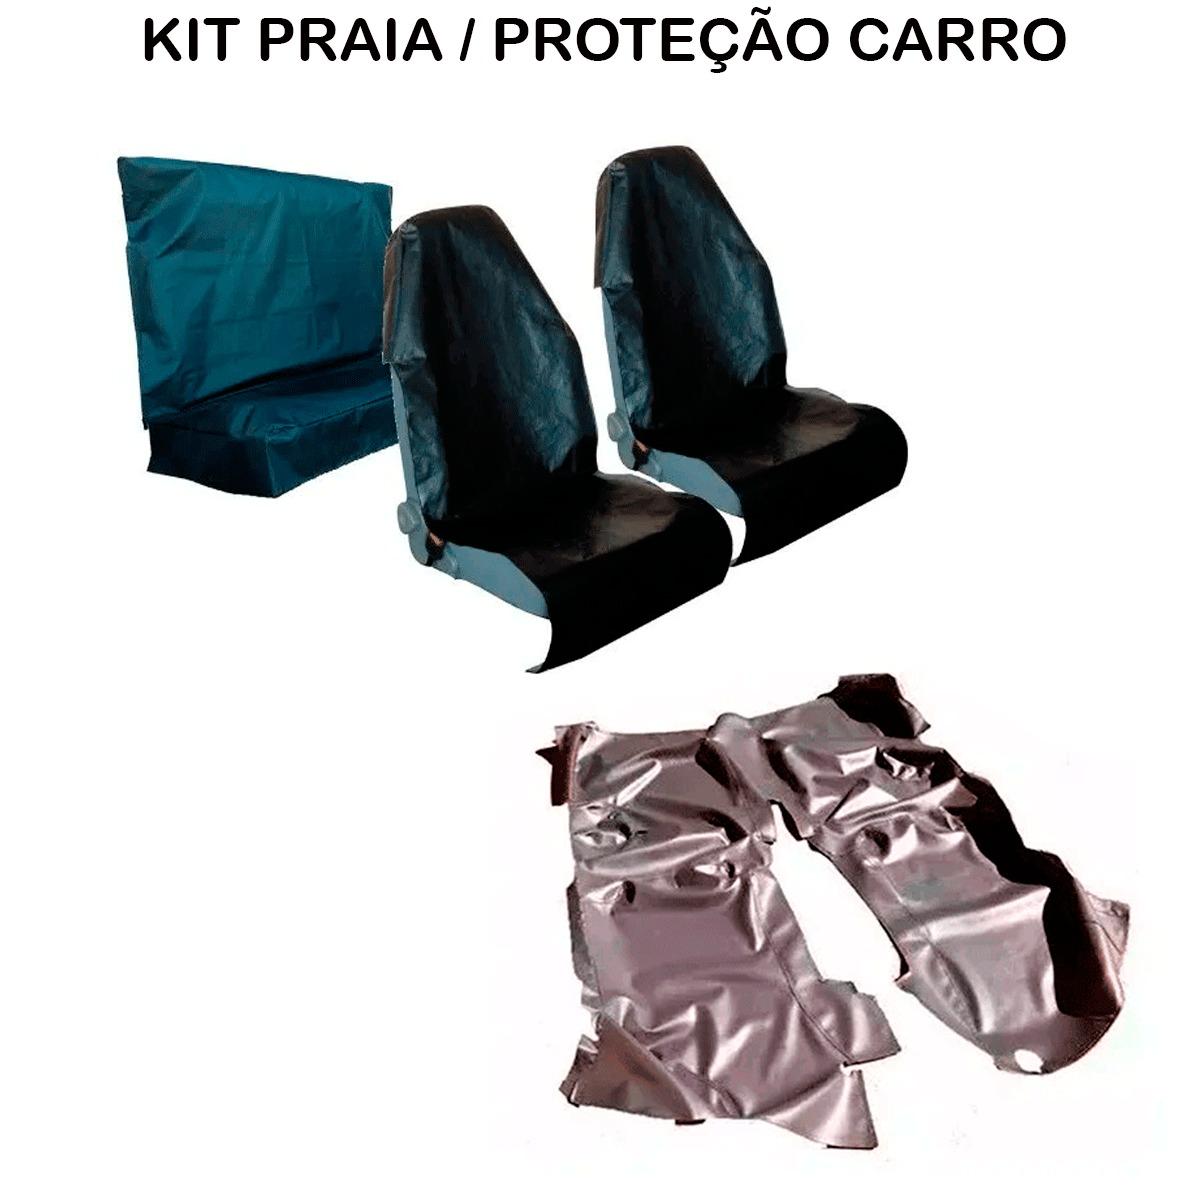 Tapete Em Vinil Volkswagen Passat até 98 + Capa Banco Protecao Banco Areia Suor Academia